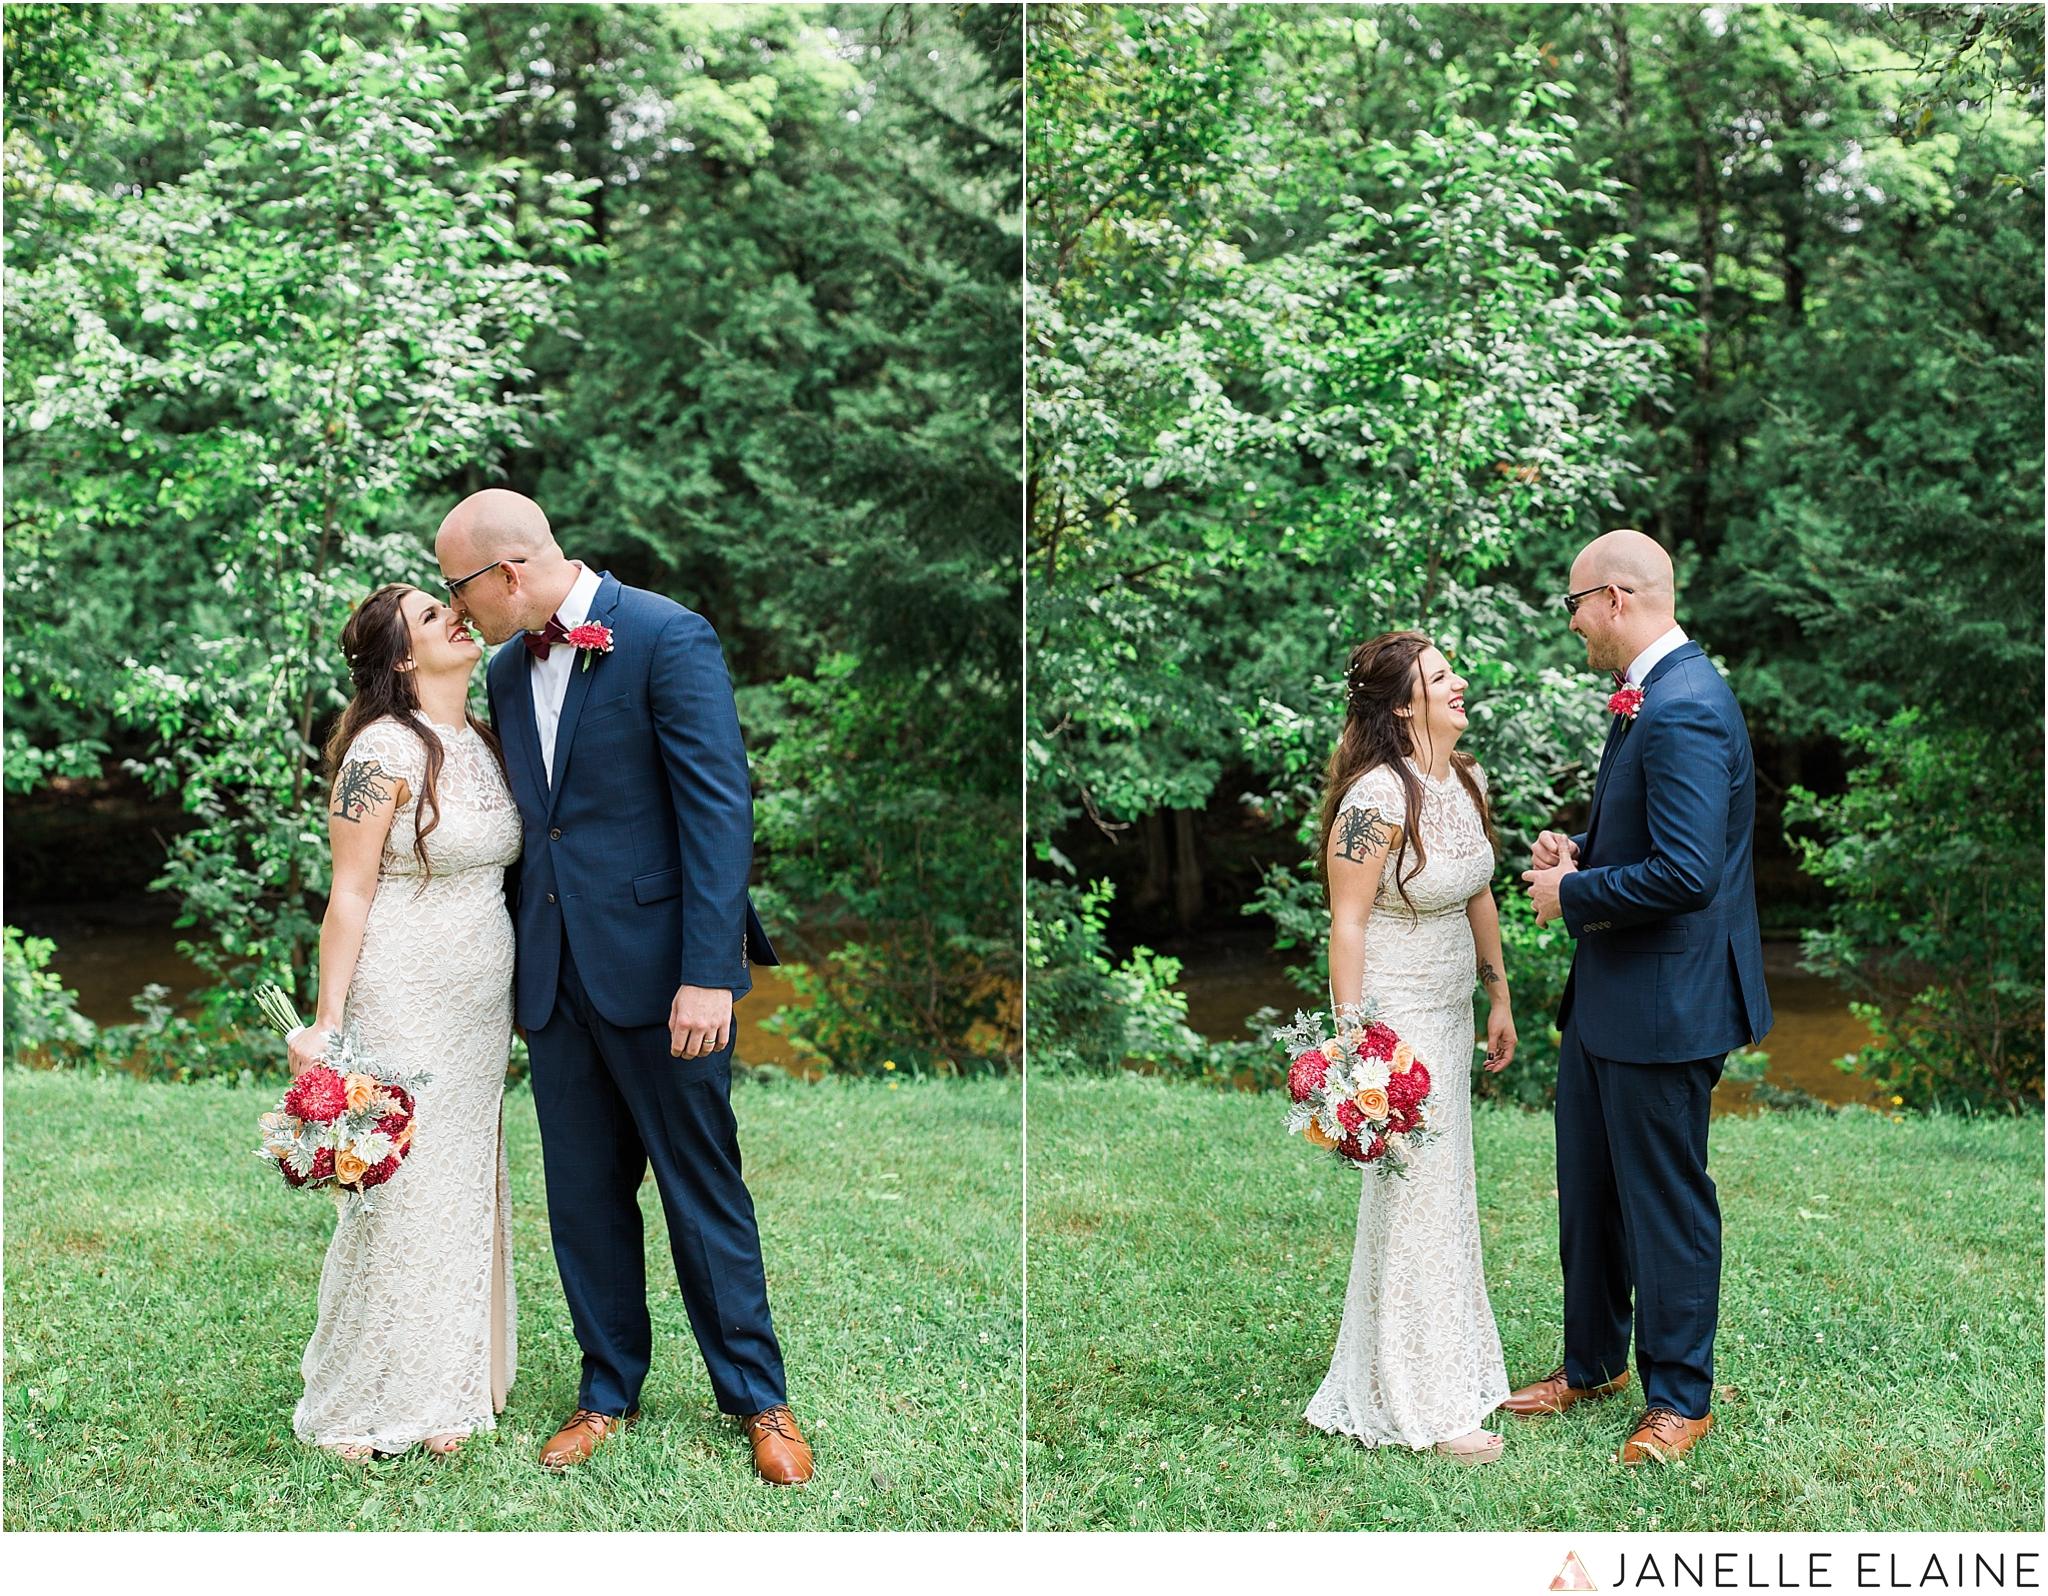 janelle elaine photography-seattle-destination-wedding-photographer-72.jpg